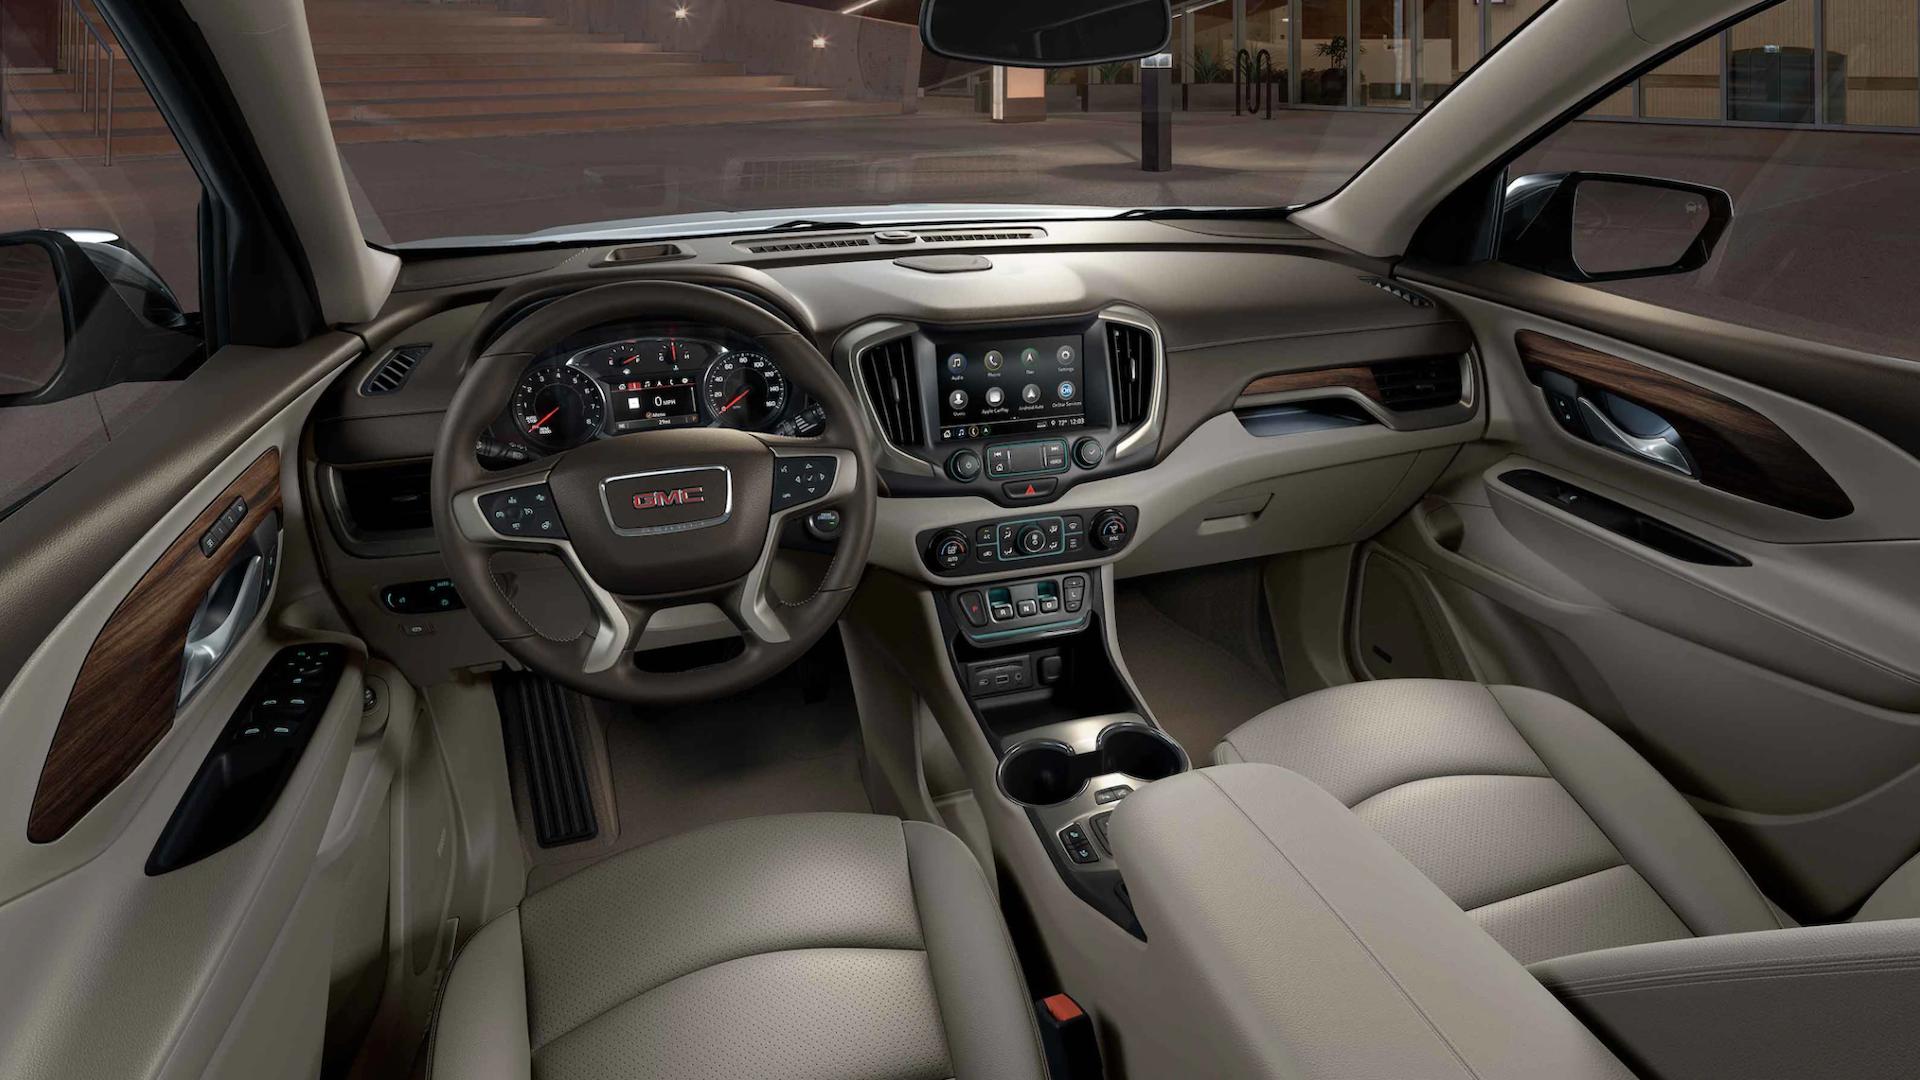 Photos of the sleek interior of the 2021 Terrain SUV